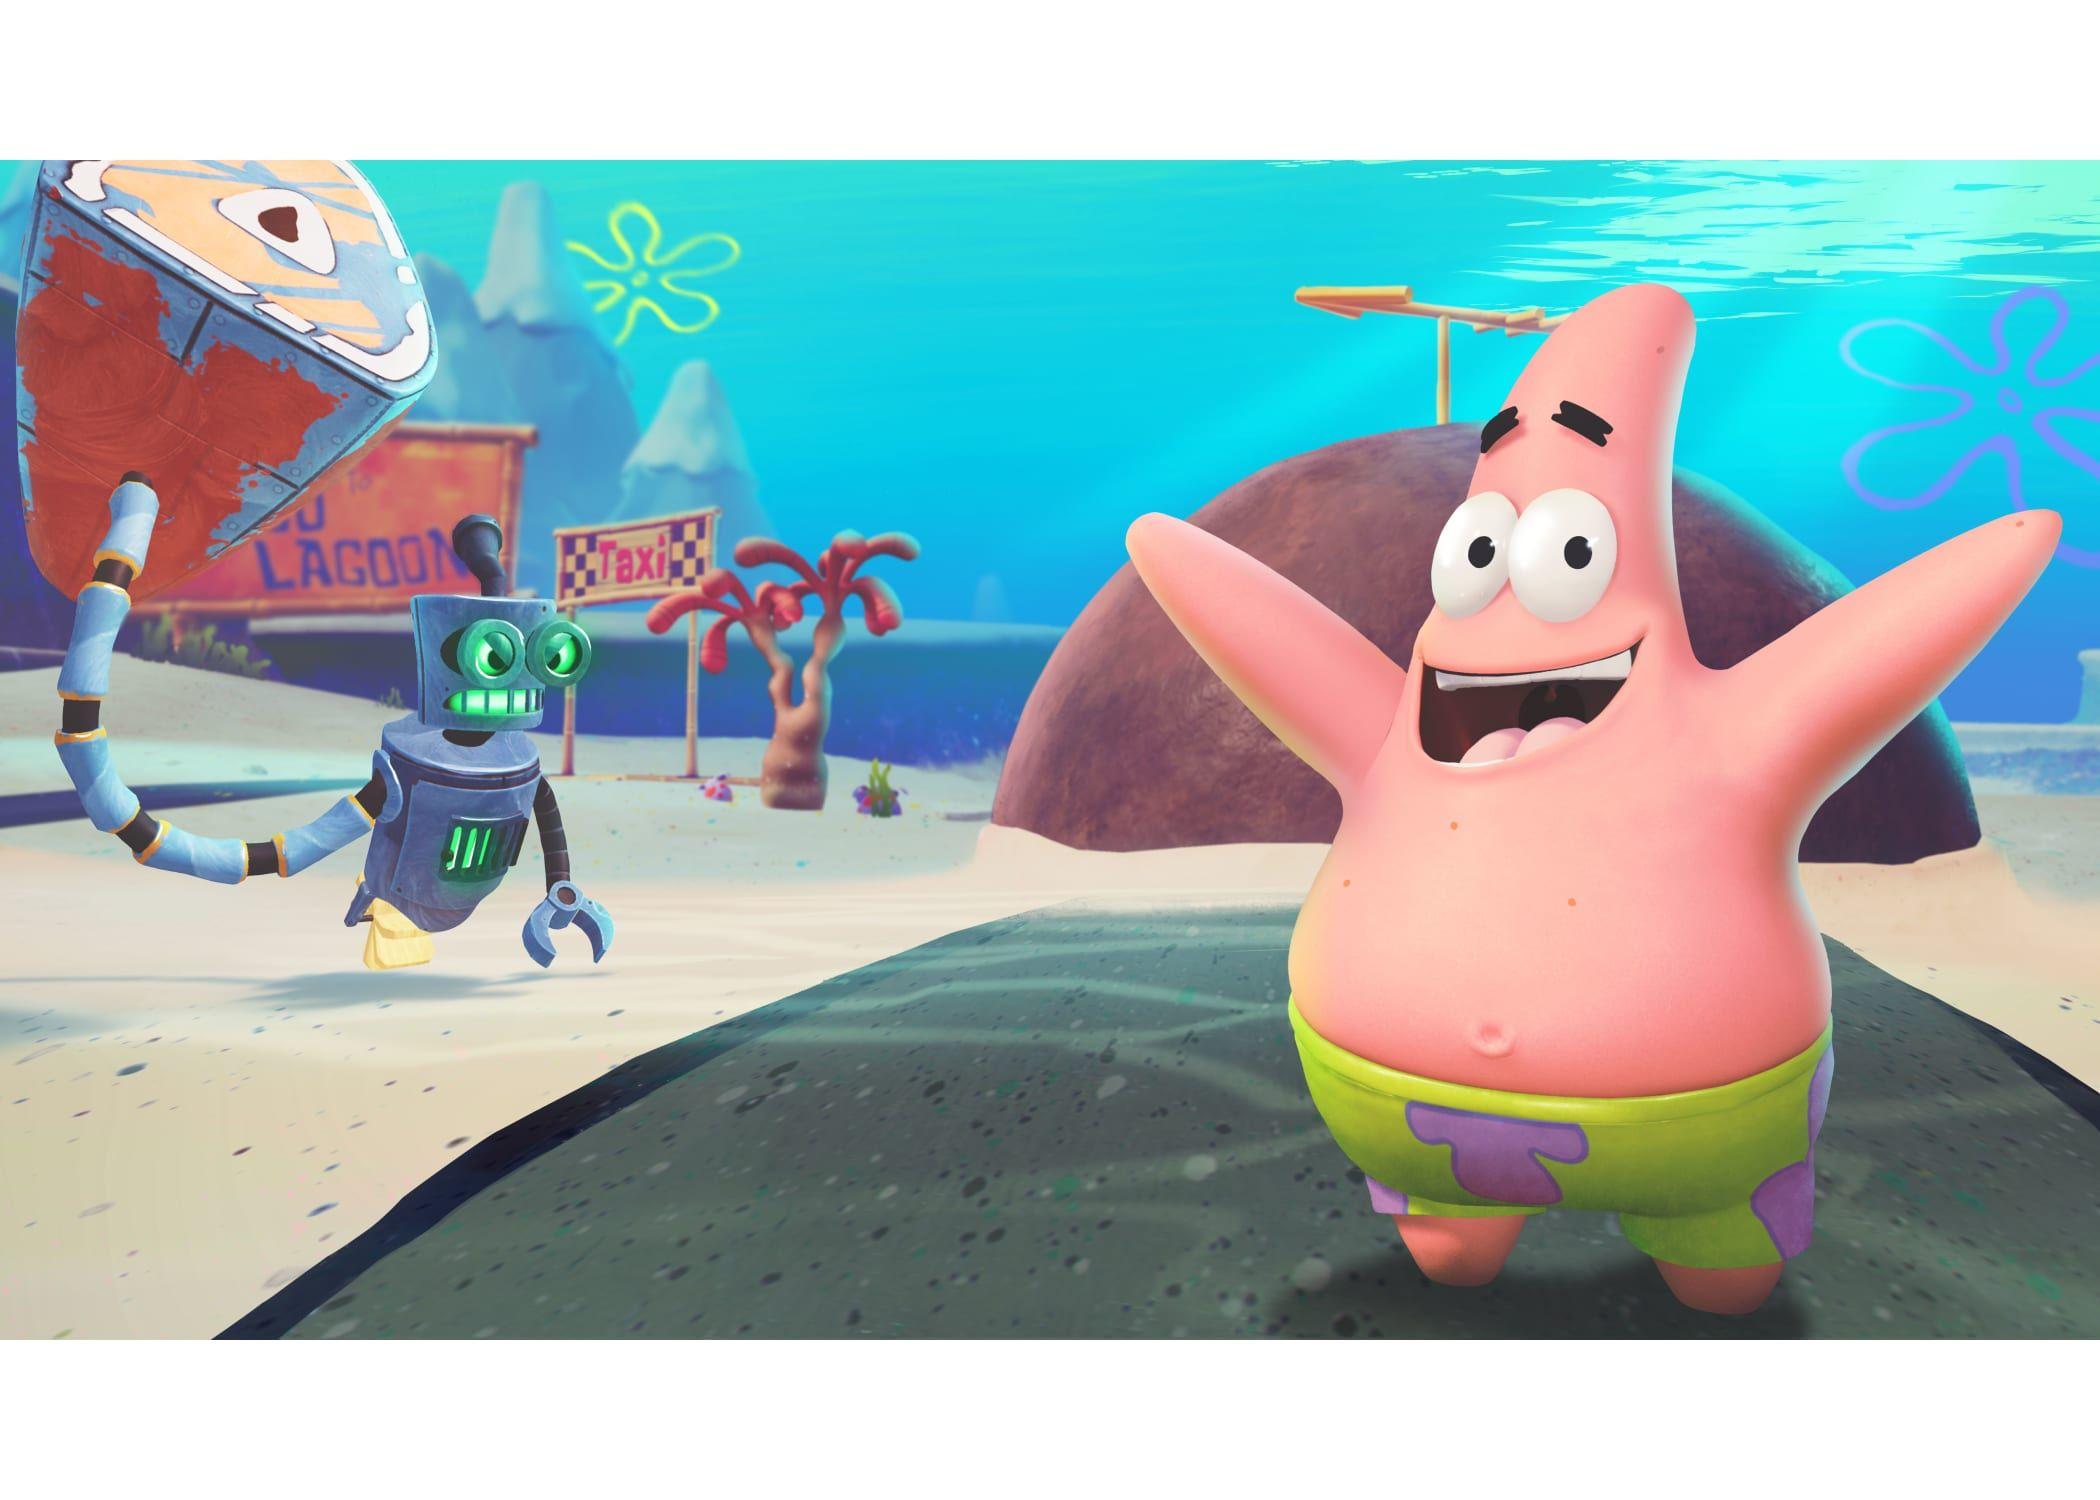 Buy Spongebob Squarepants Battle For Bikini Bottom Rehydrated On Xbox One Game Affiliate Sponsored Square In 2020 Spongebob Squarepants Spongebob Squarepants